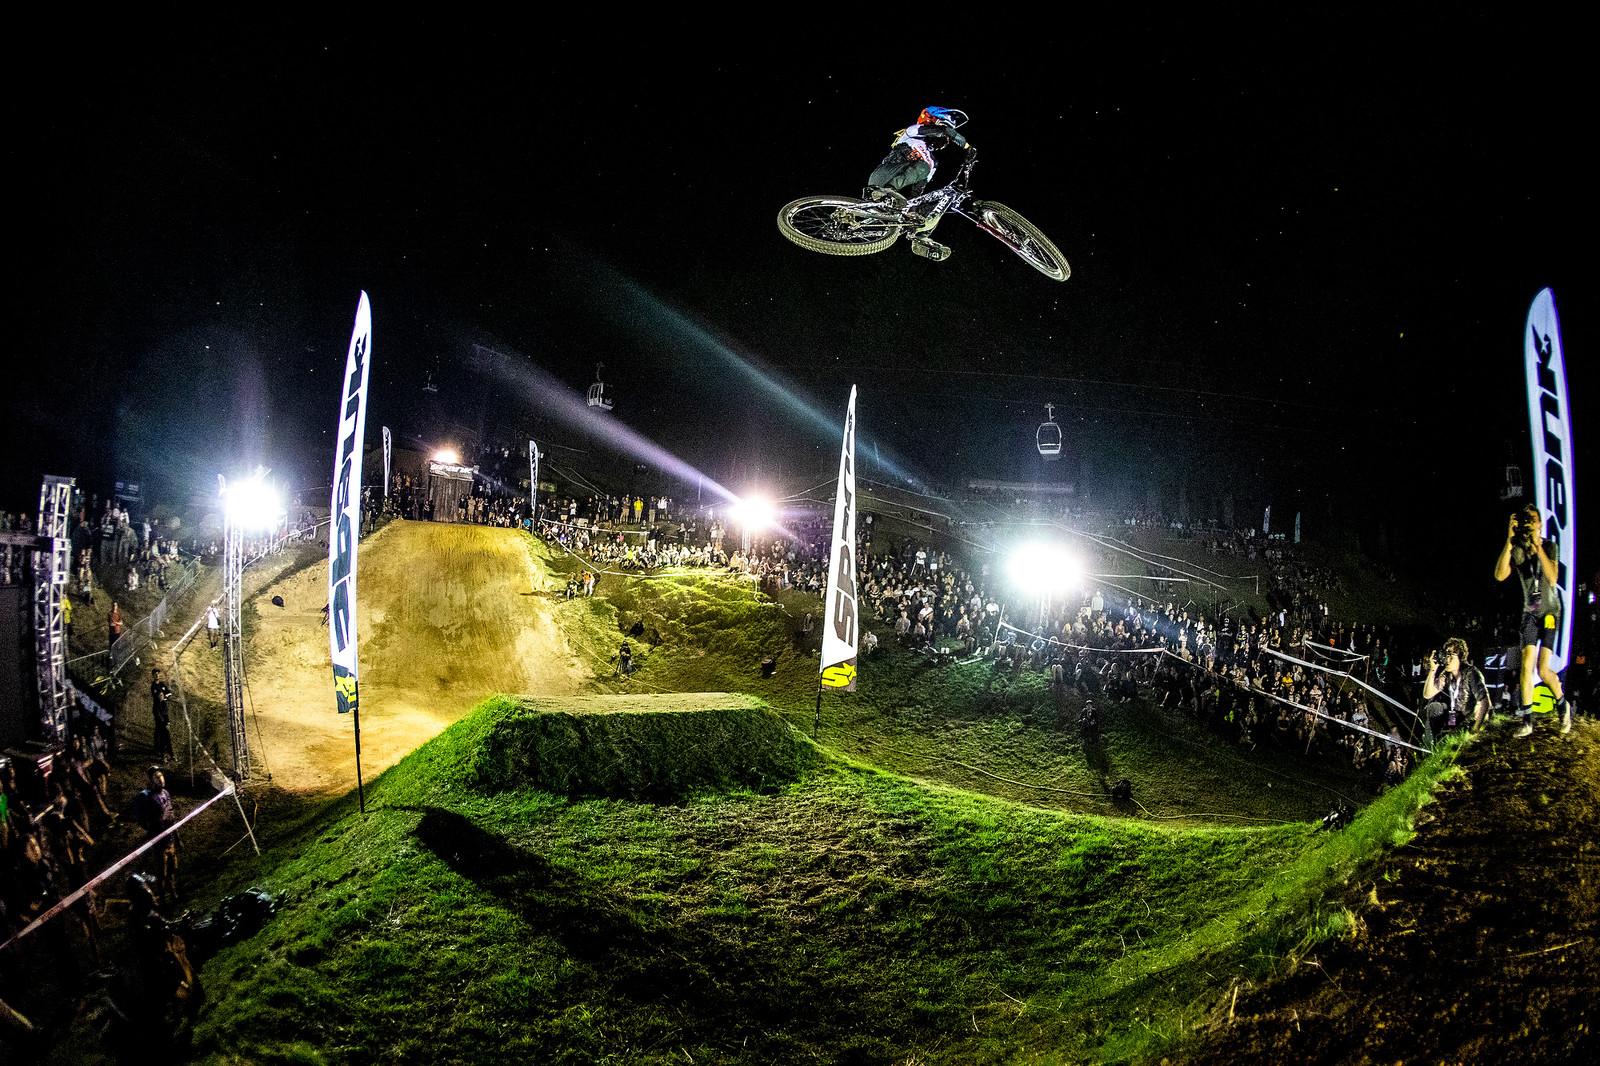 Casey Brown - WHIP OFF GALLERY - Crankworx Rotorua - Mountain Biking Pictures - Vital MTB